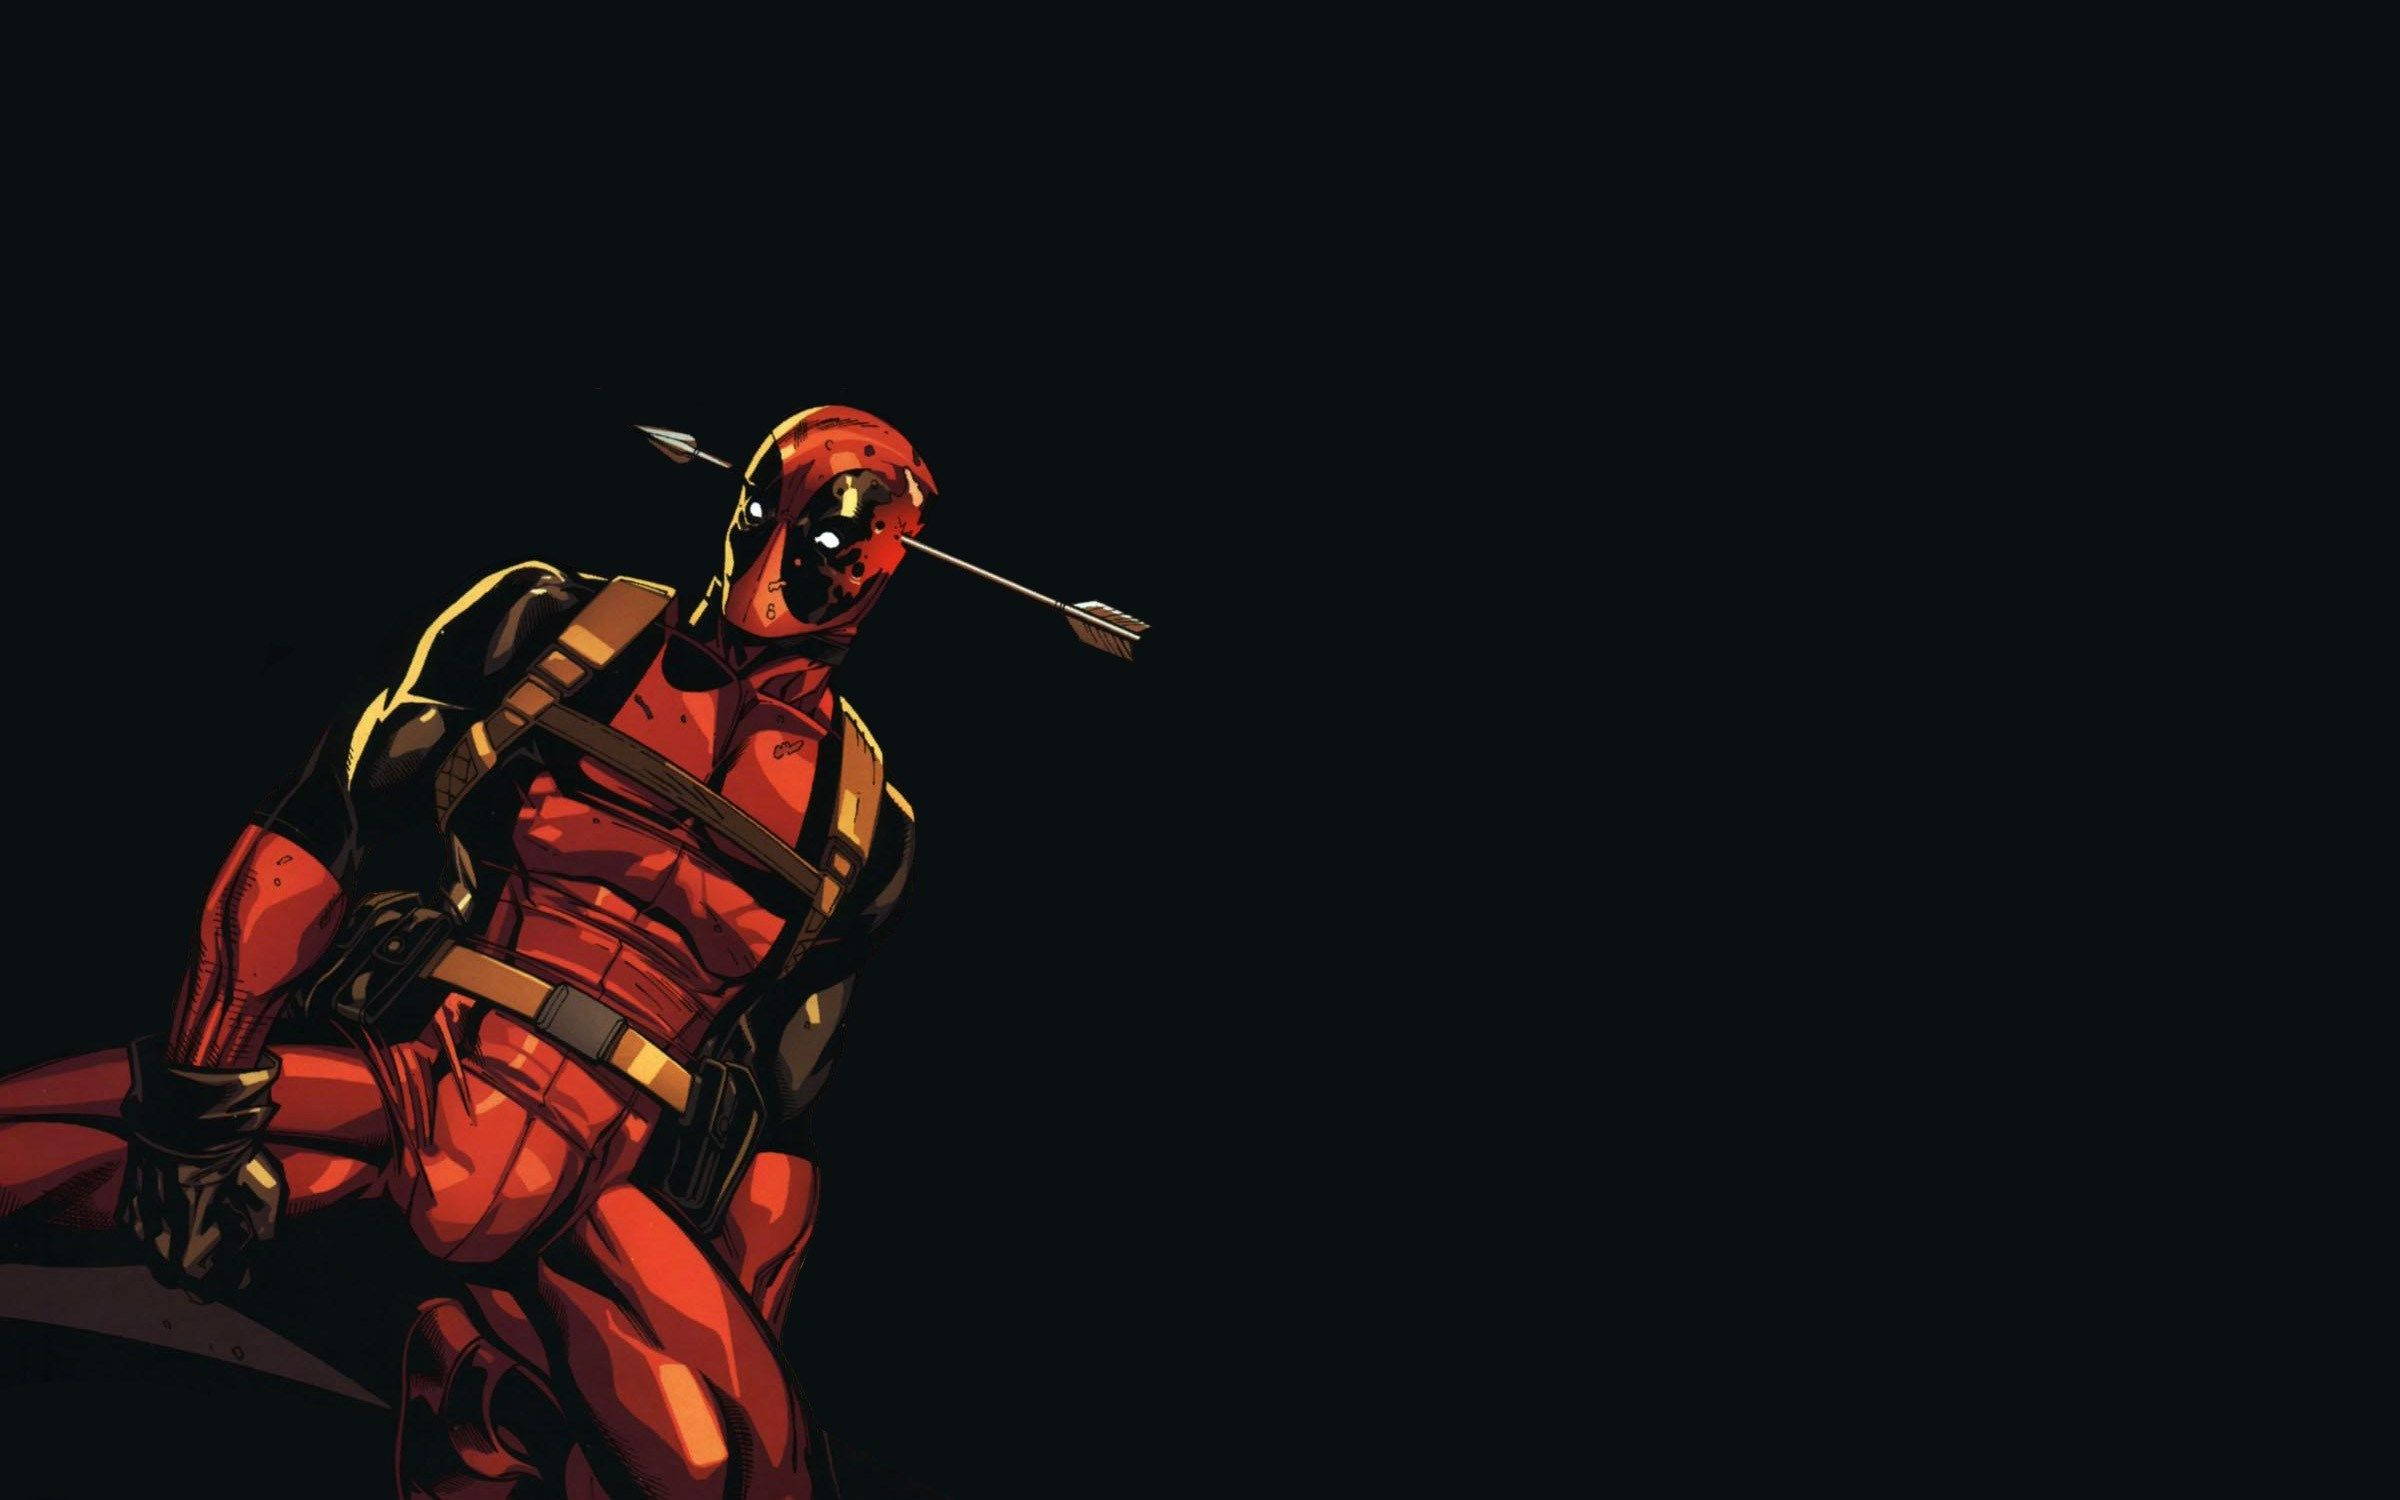 deadpool comic art wallpapers hd desktop and mobile backgrounds